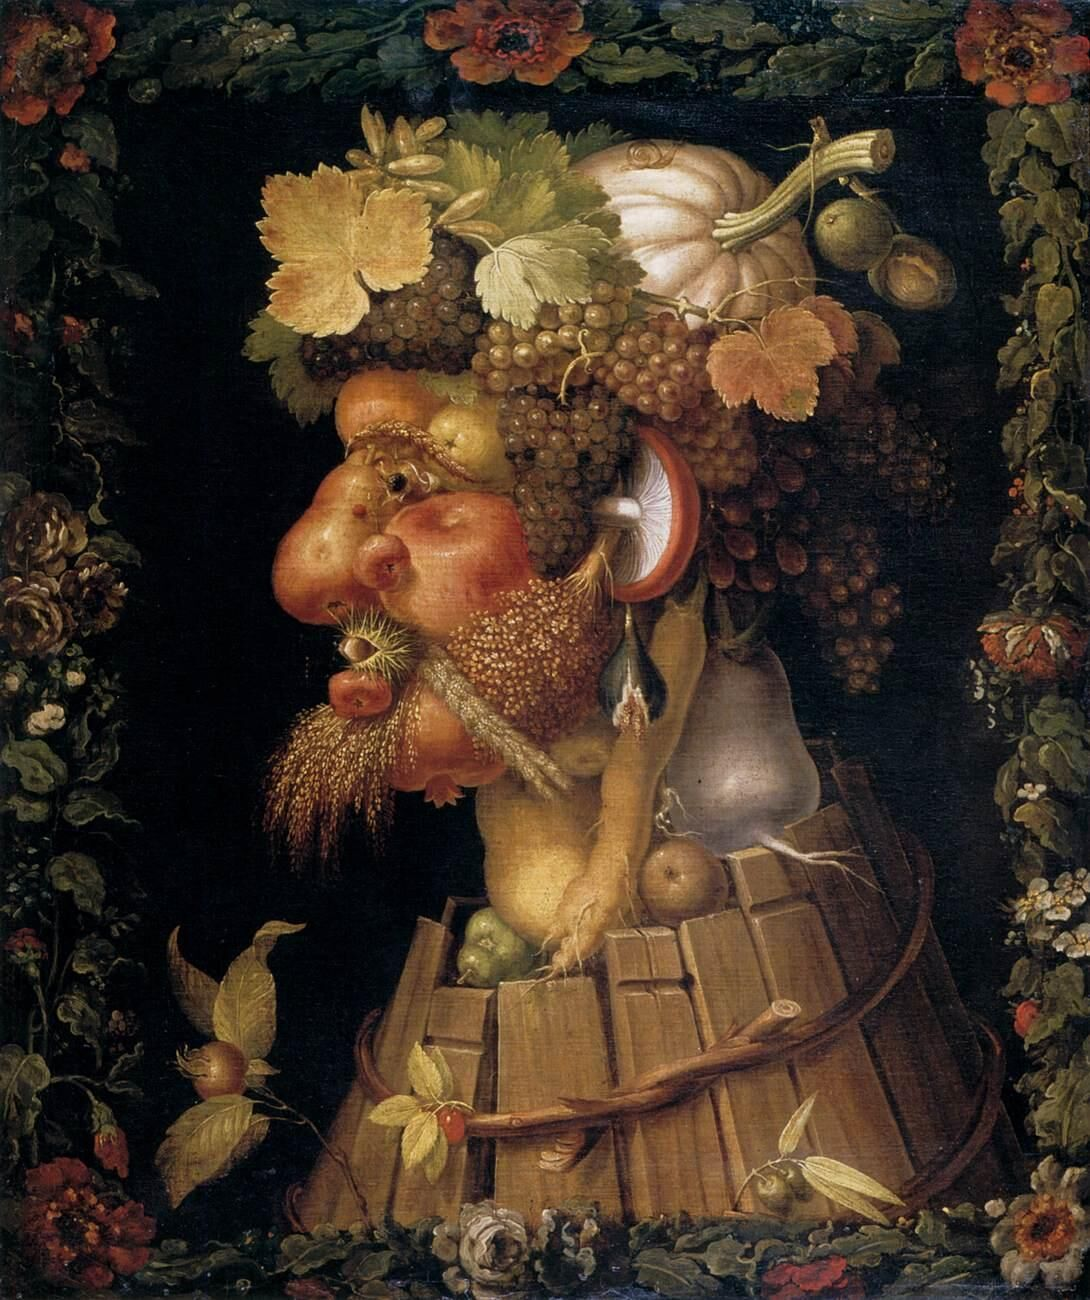 Giuseppe Arcimboldo, Autumn, 1573. Photo via Wikimedia Commons.